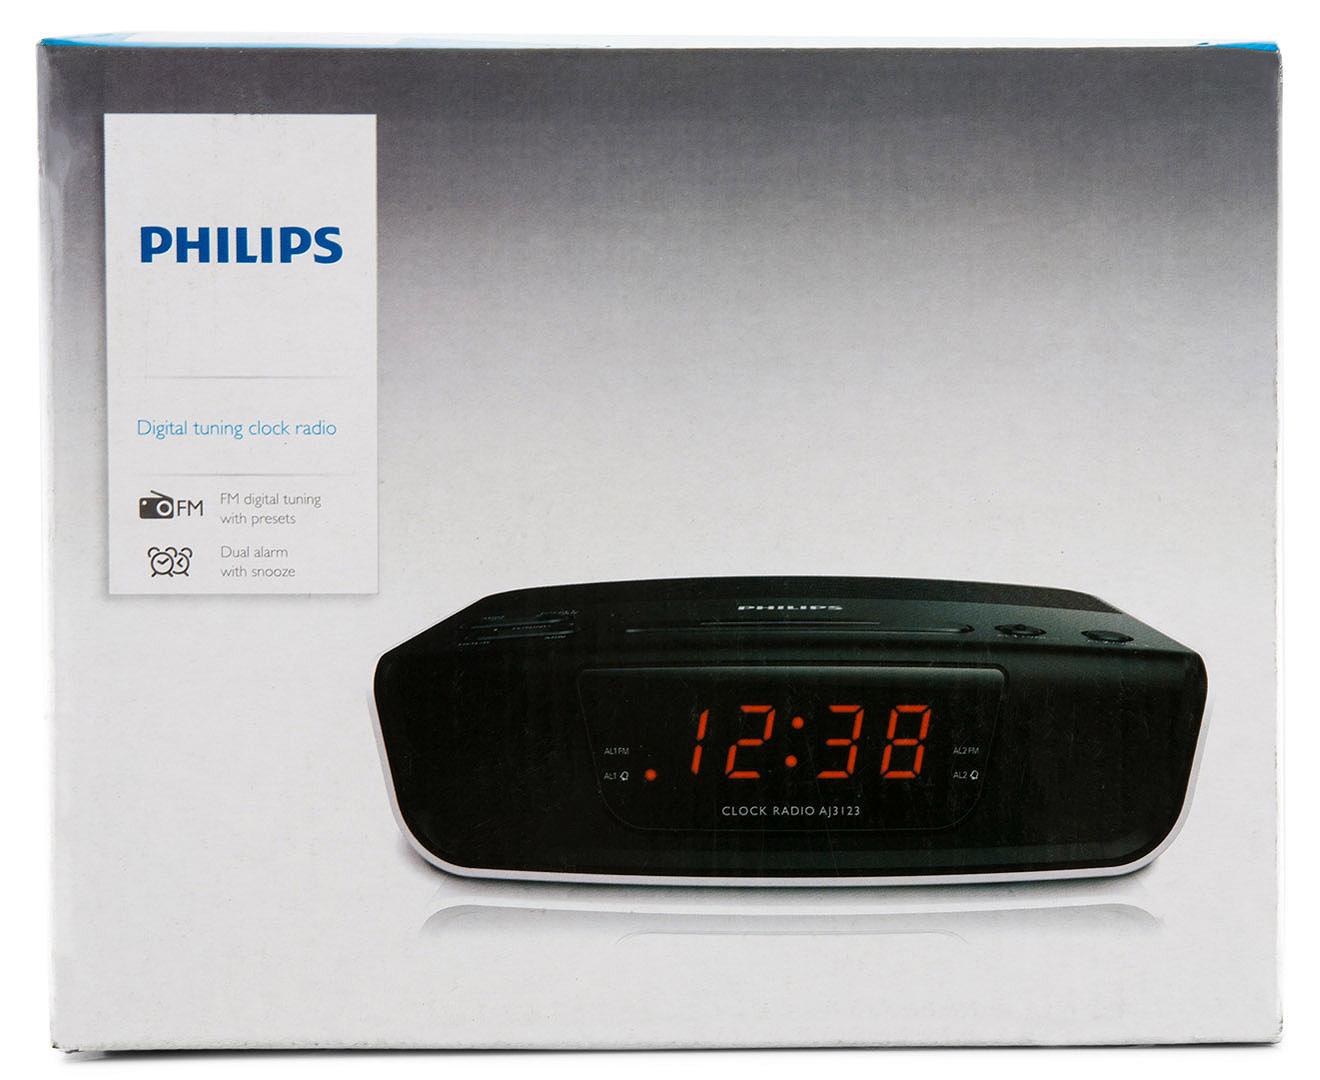 philips digital tuning 24hr clock radio black white great daily deals at australia 39 s. Black Bedroom Furniture Sets. Home Design Ideas